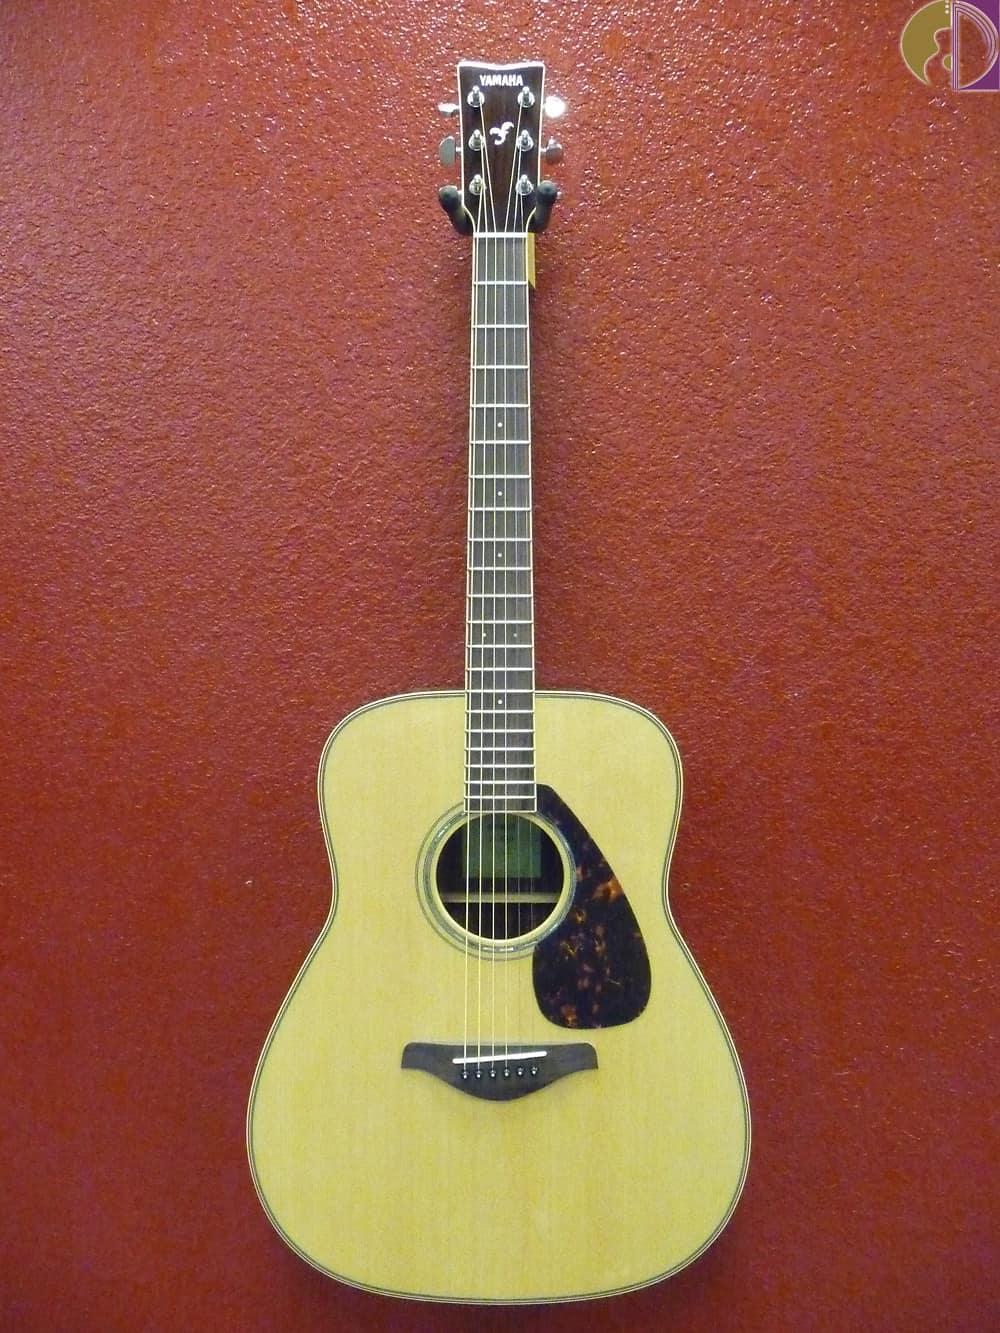 Yamaha fg830 acoustic guitar solid top natural reverb for Yamaha fg830 specs